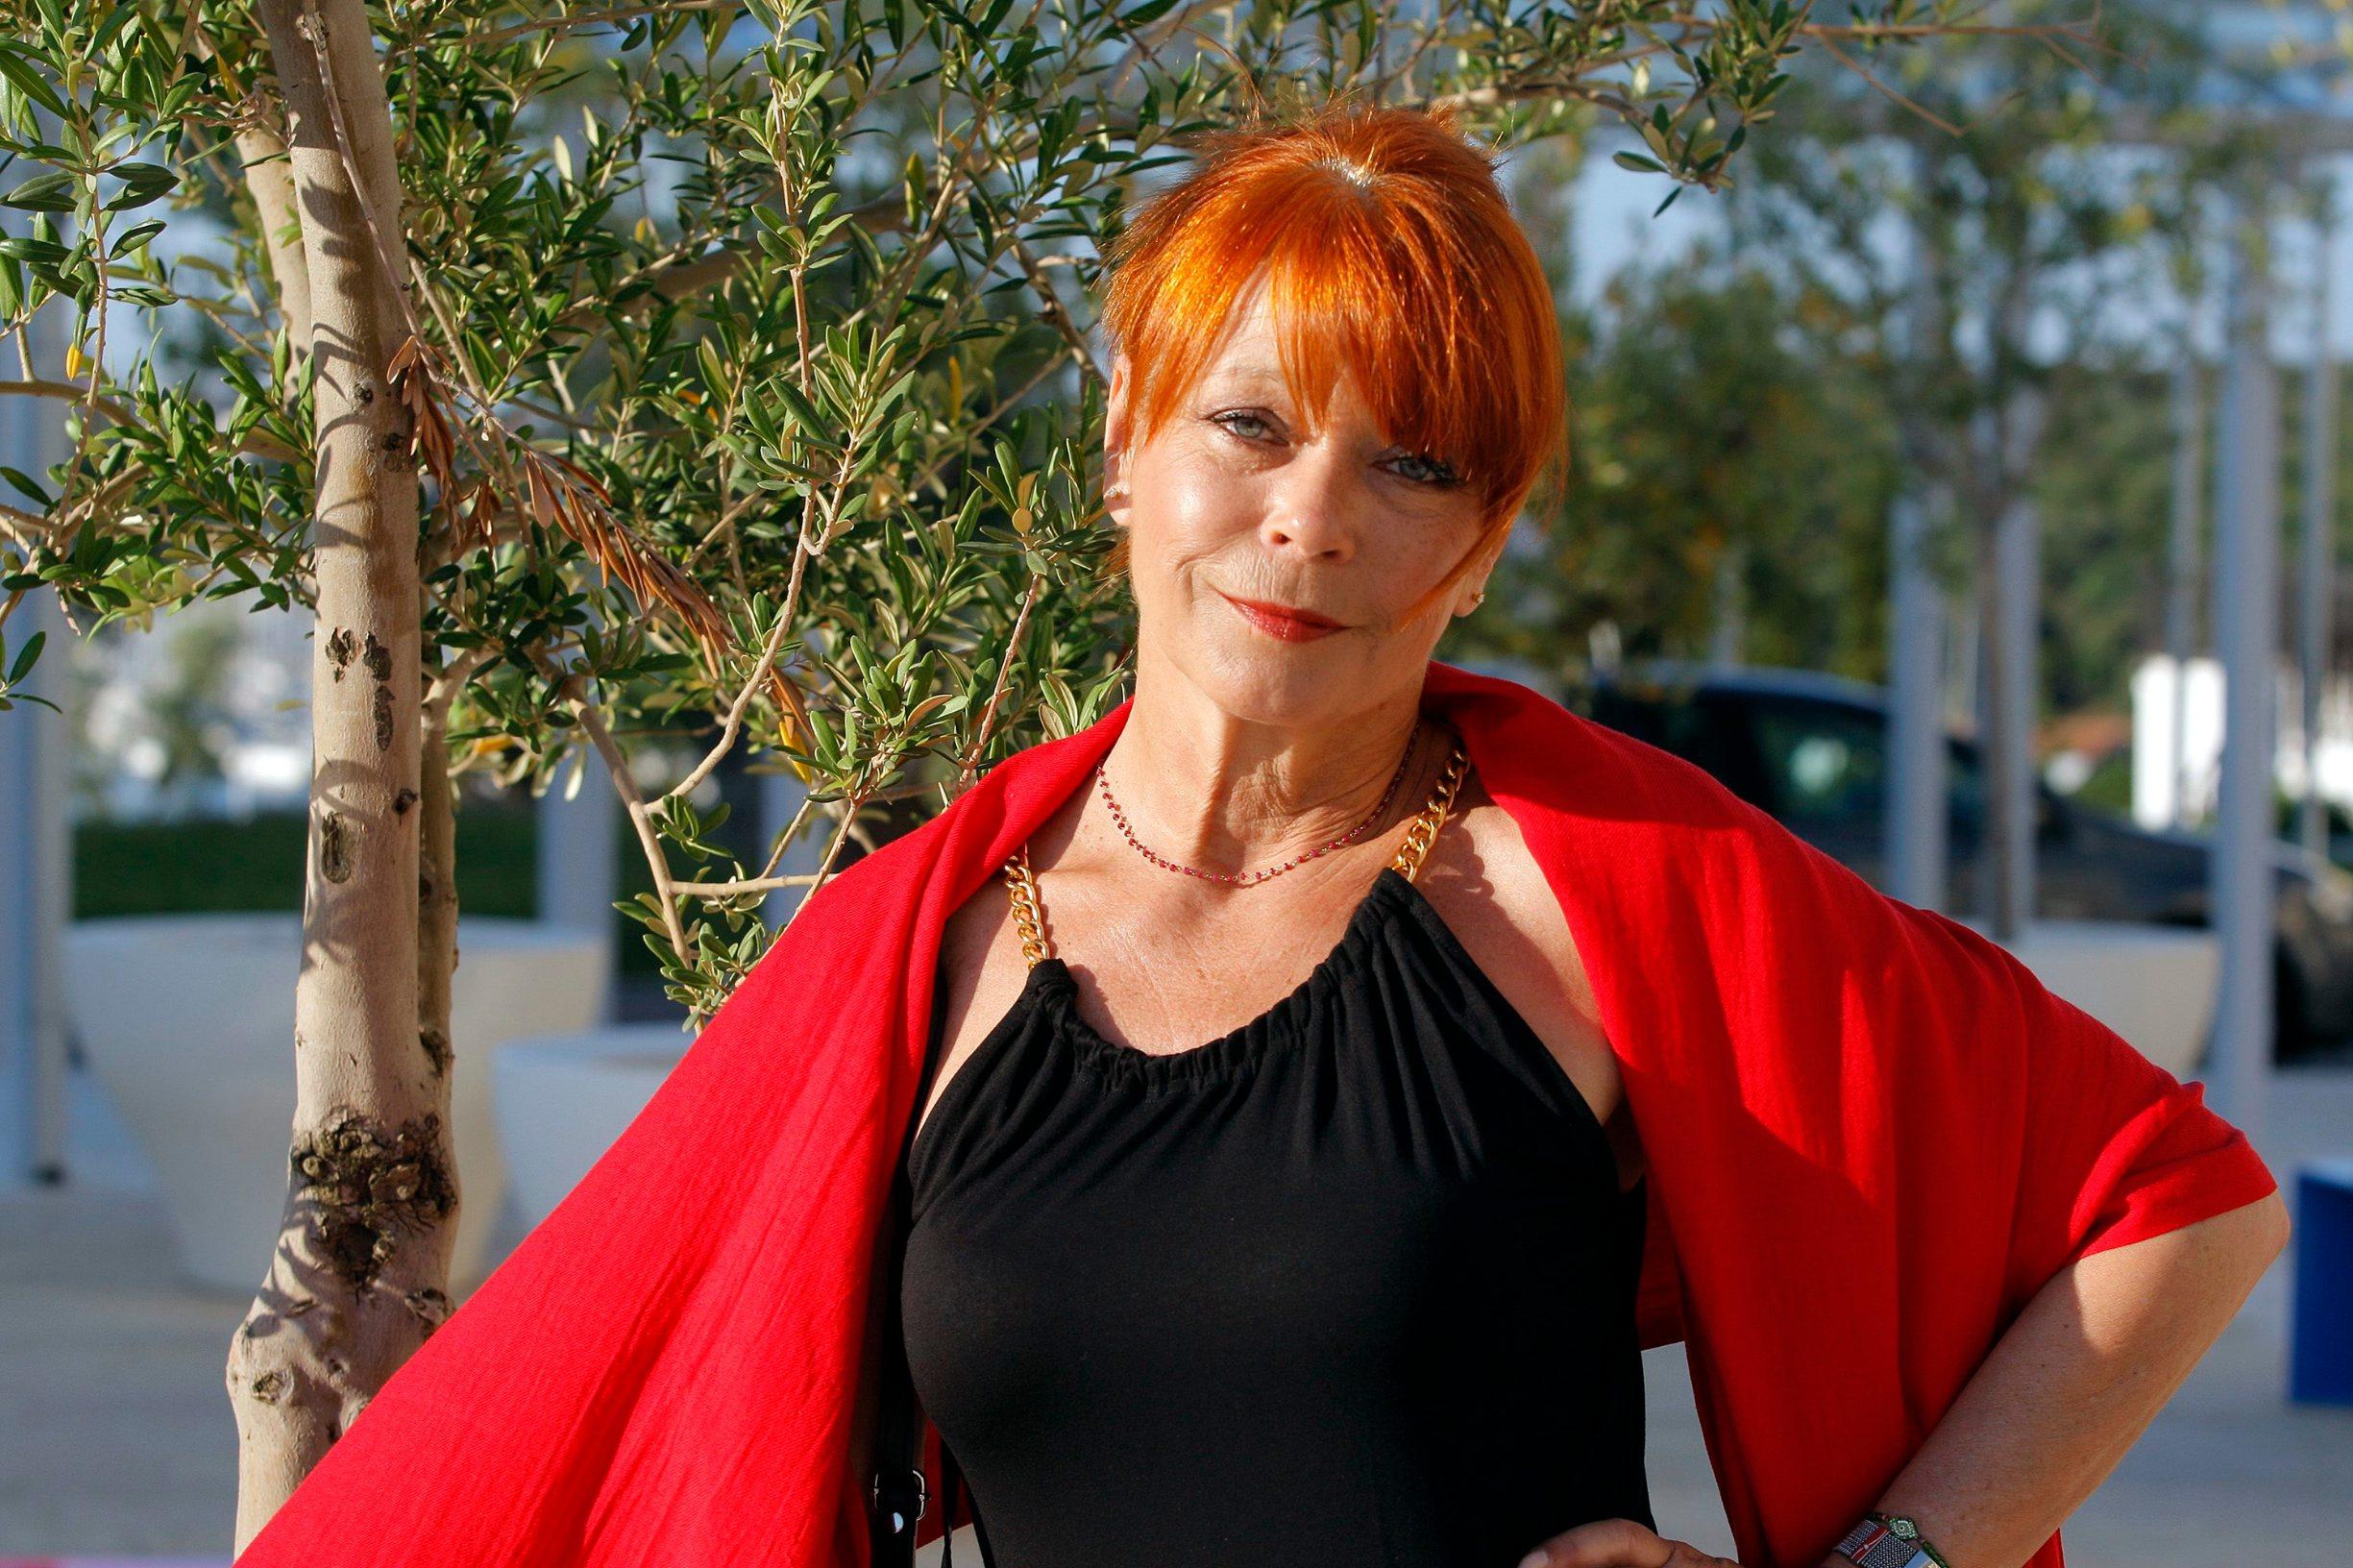 Pula, 170713.    Neda Arneric, glumica. Snimljena na terasi ispred hotela Histria. Foto: Goran Sebelic / CROPIX